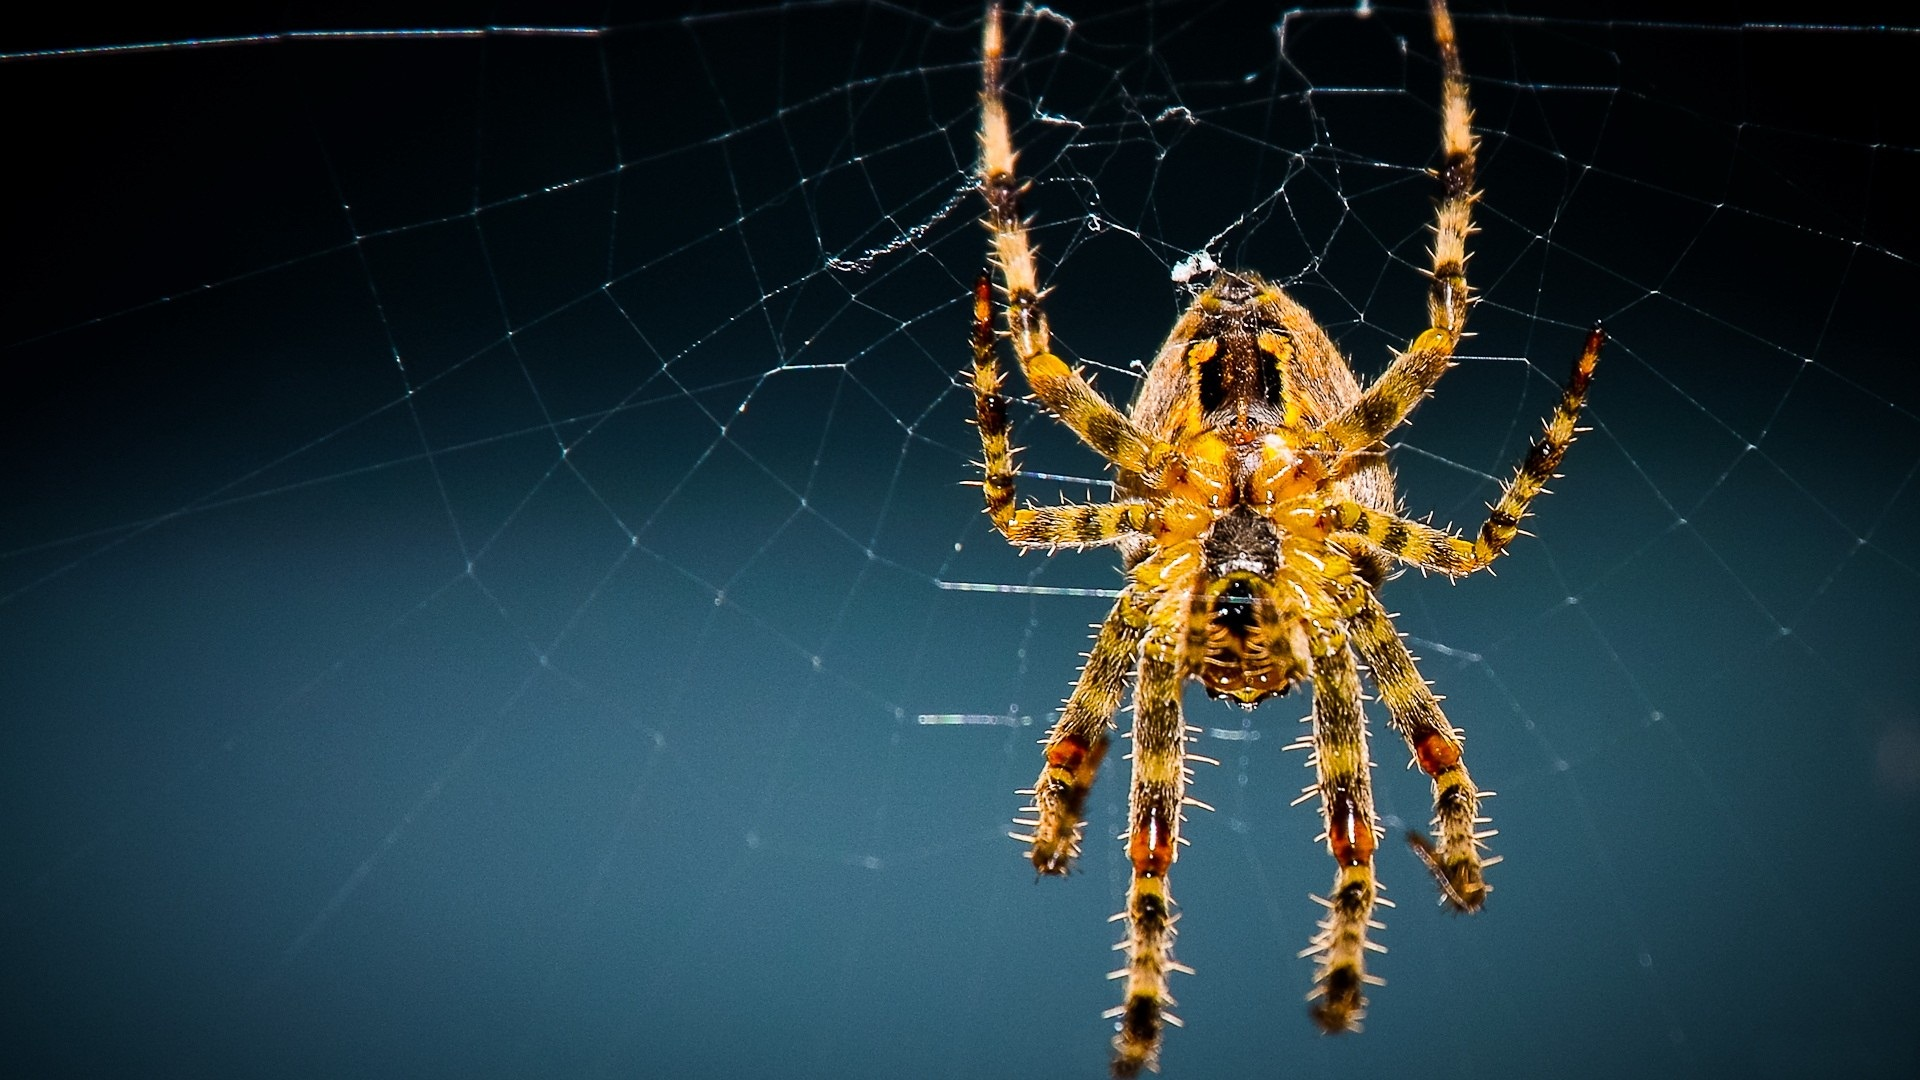 природа животные паук  № 2544270 без смс